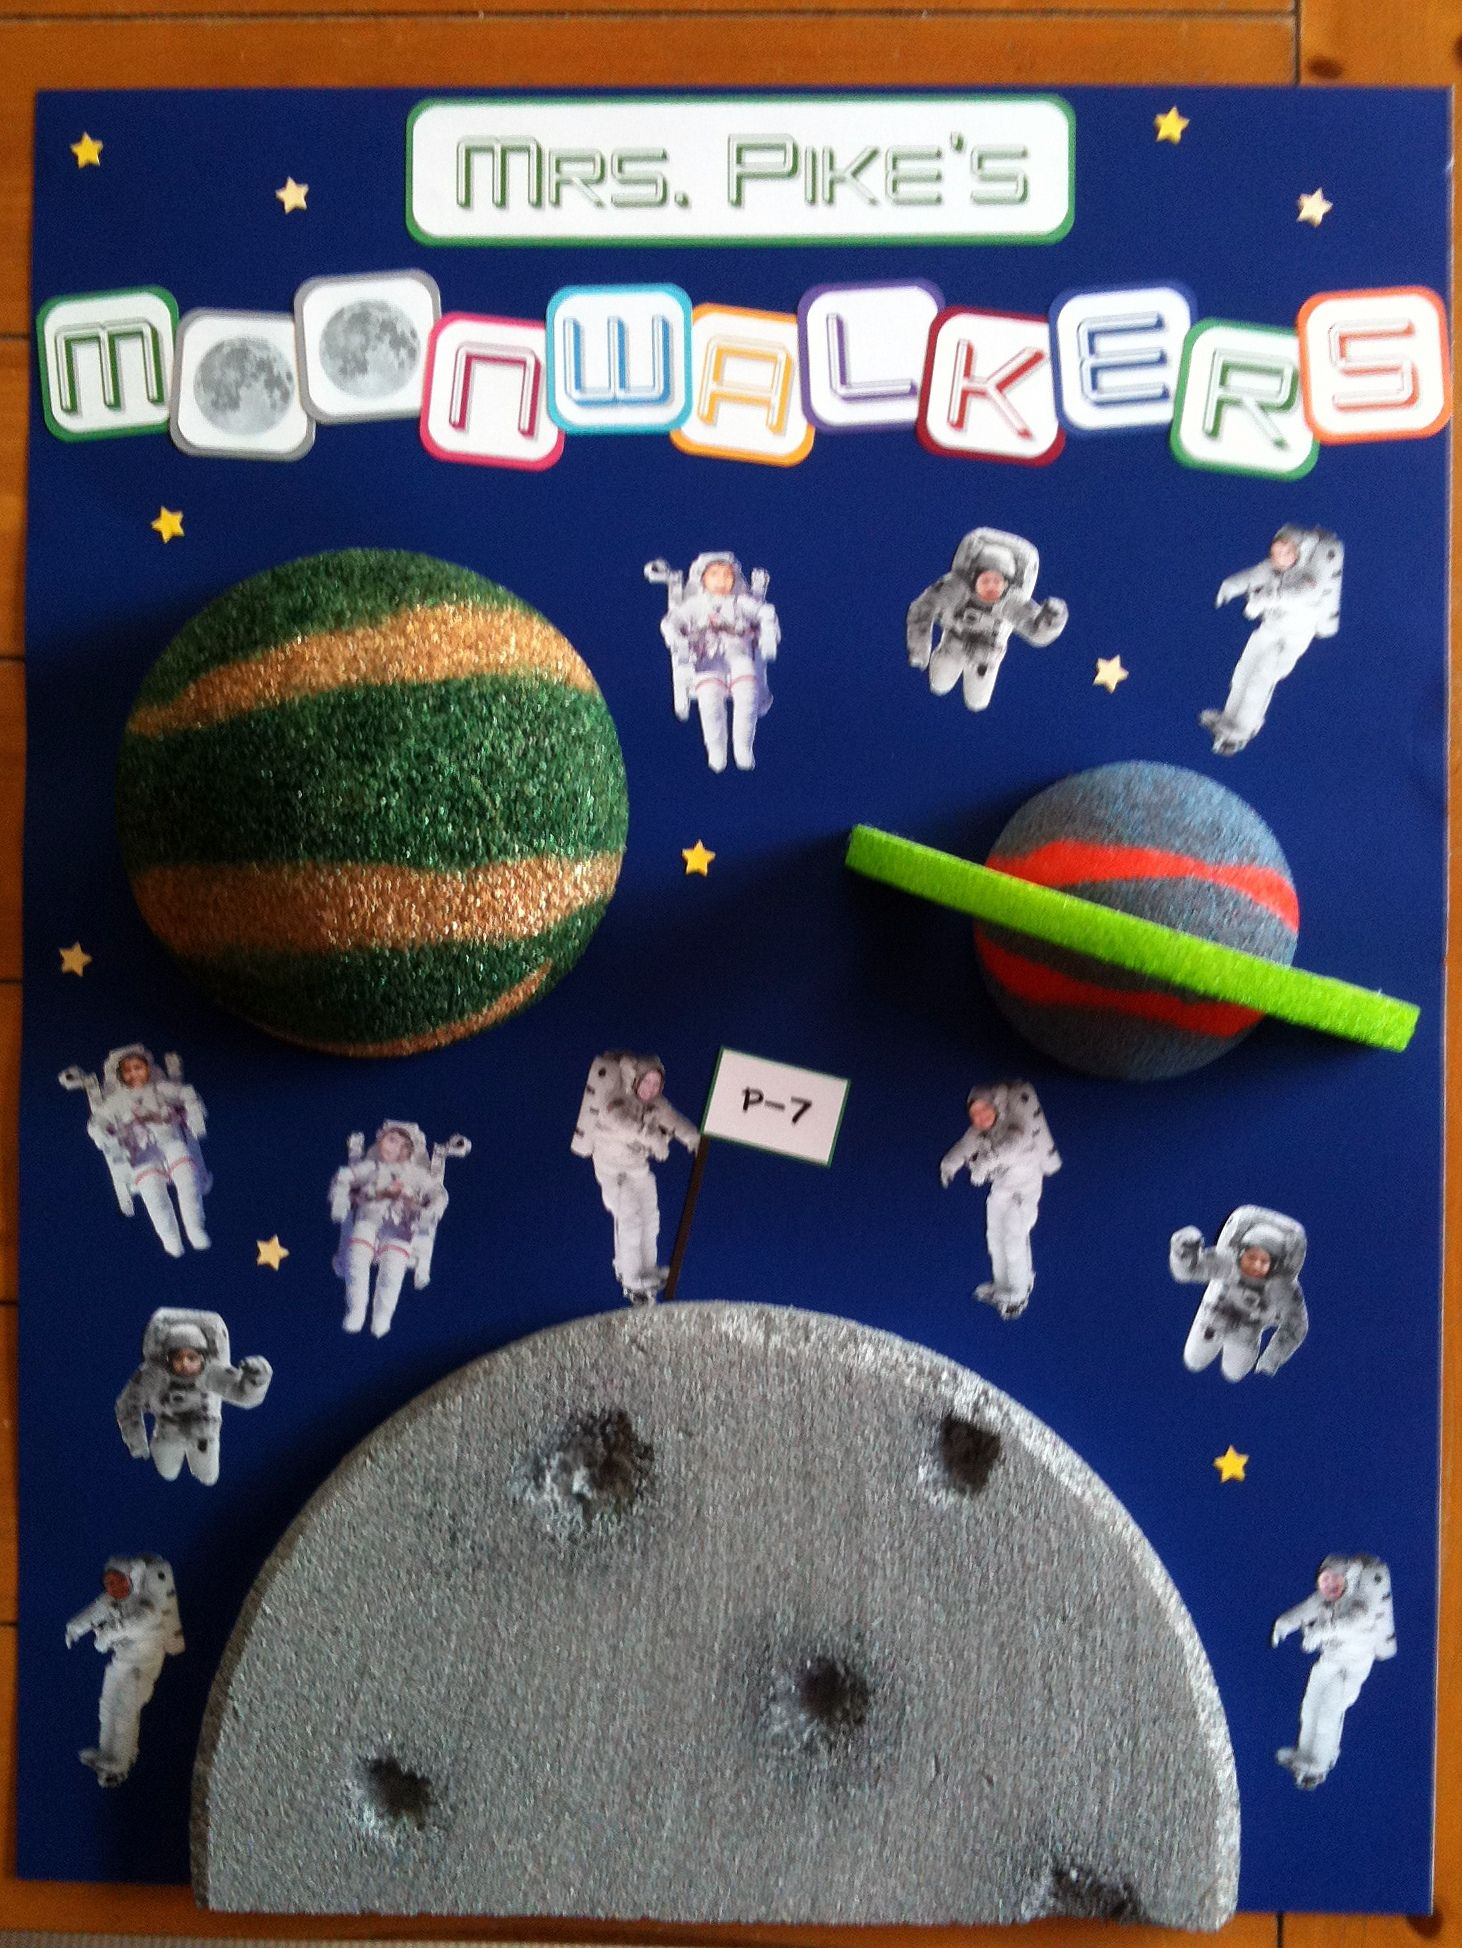 3d Space Theme Classroom Poster Photoshop Kids Faces